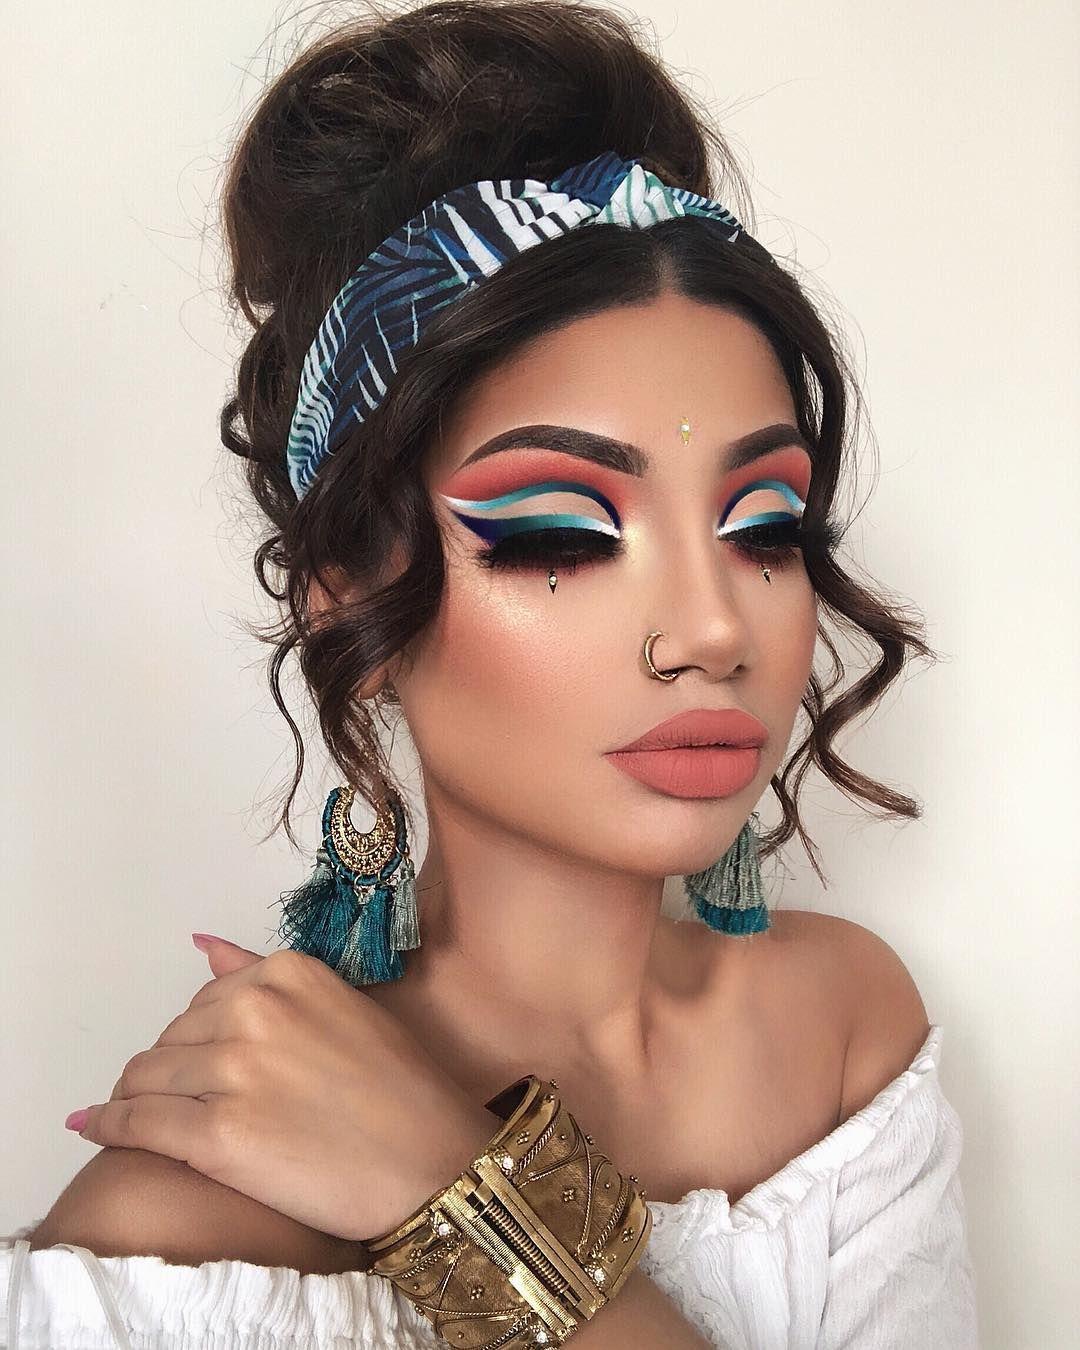 24 Makeup Looks Ideas to Inspire You Makeup